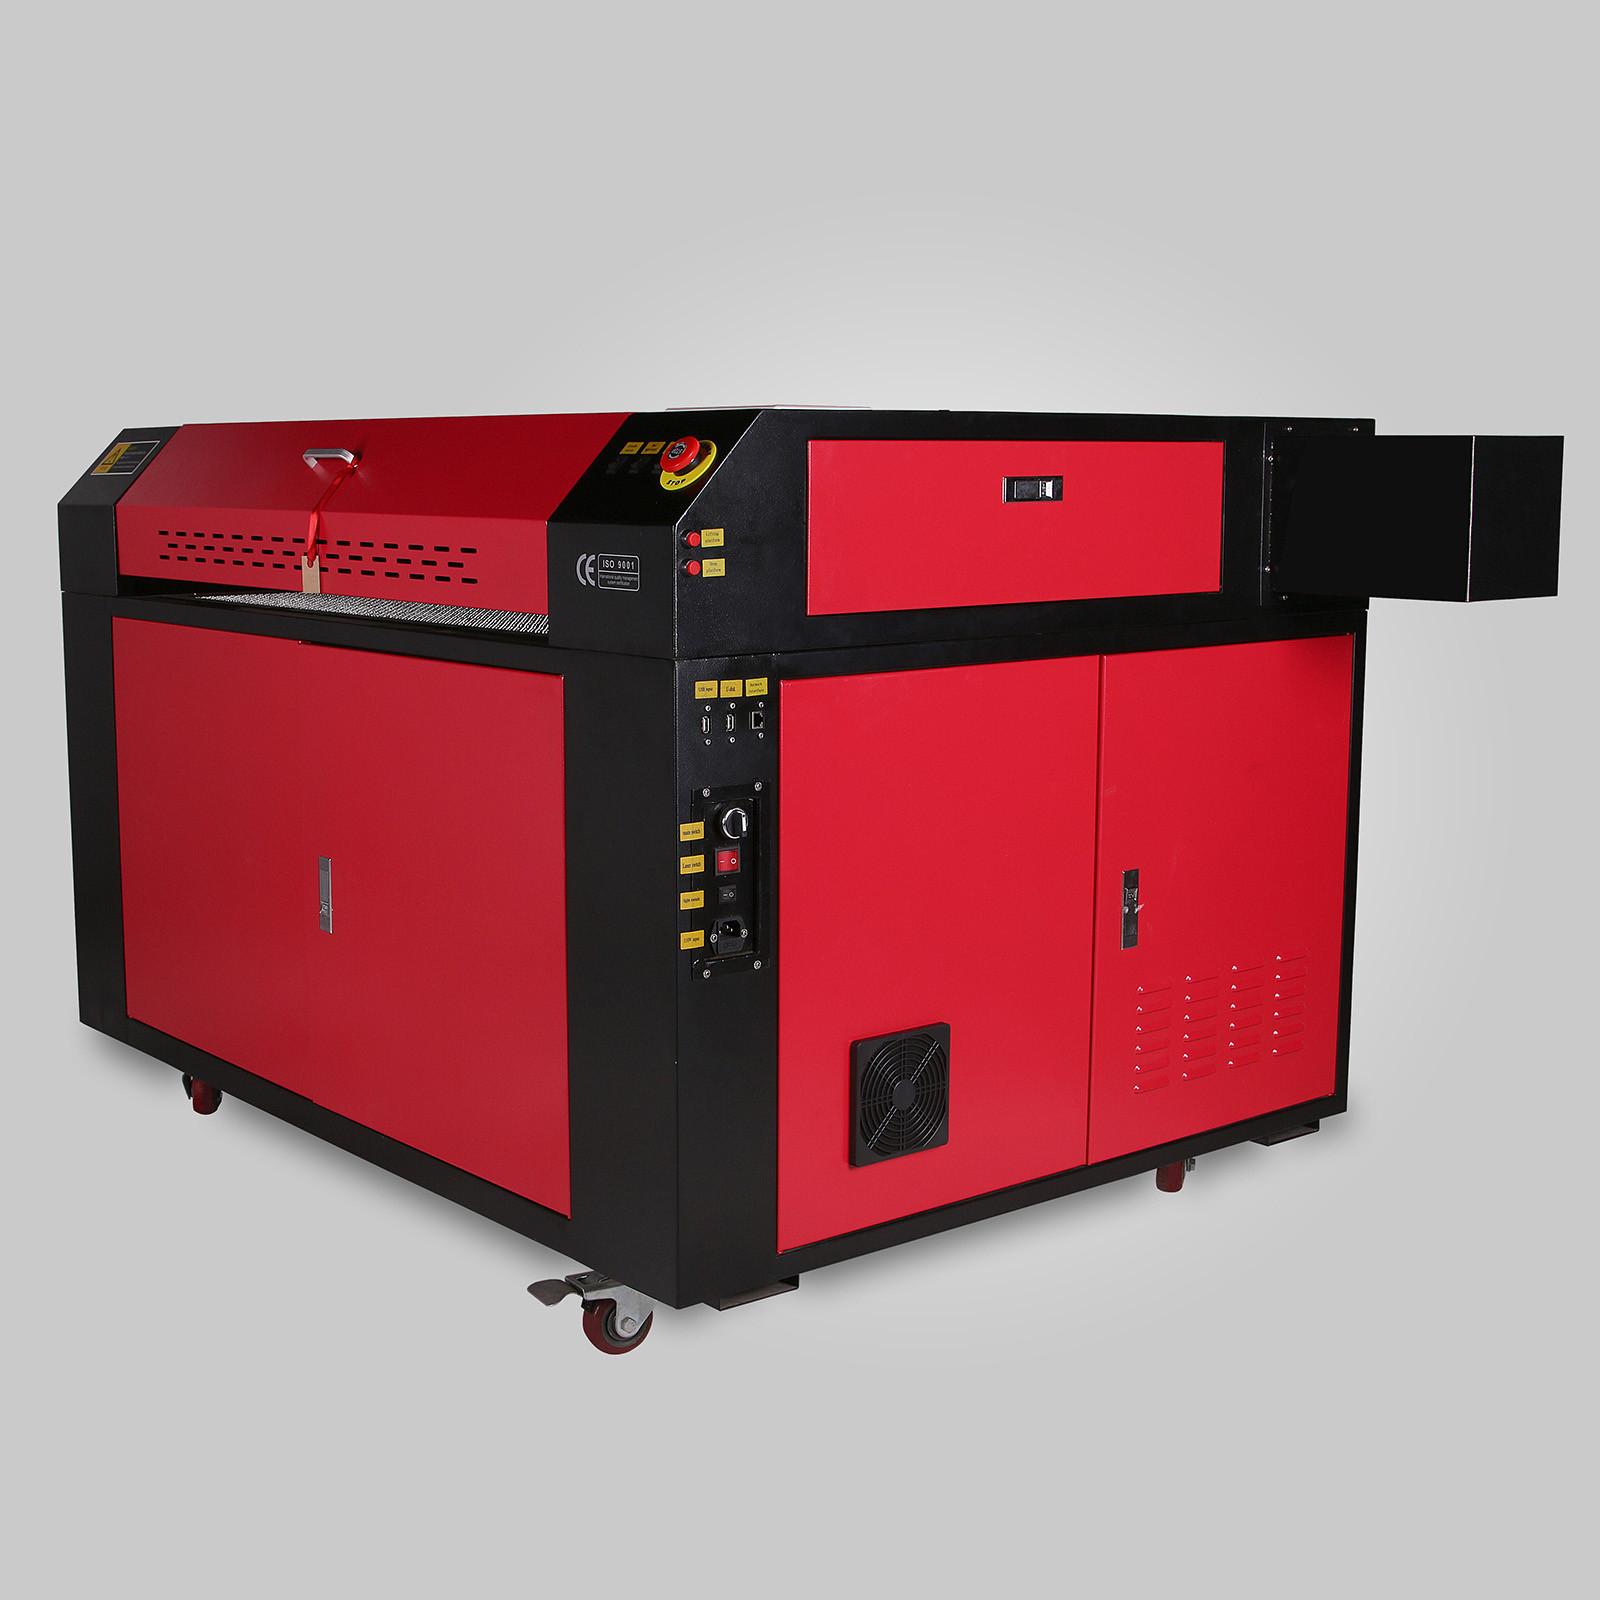 Macchina-per-Incisione-Laser-CO2-40-130W-Asse-Rotante-Tagliatrice-Incisore miniatura 64